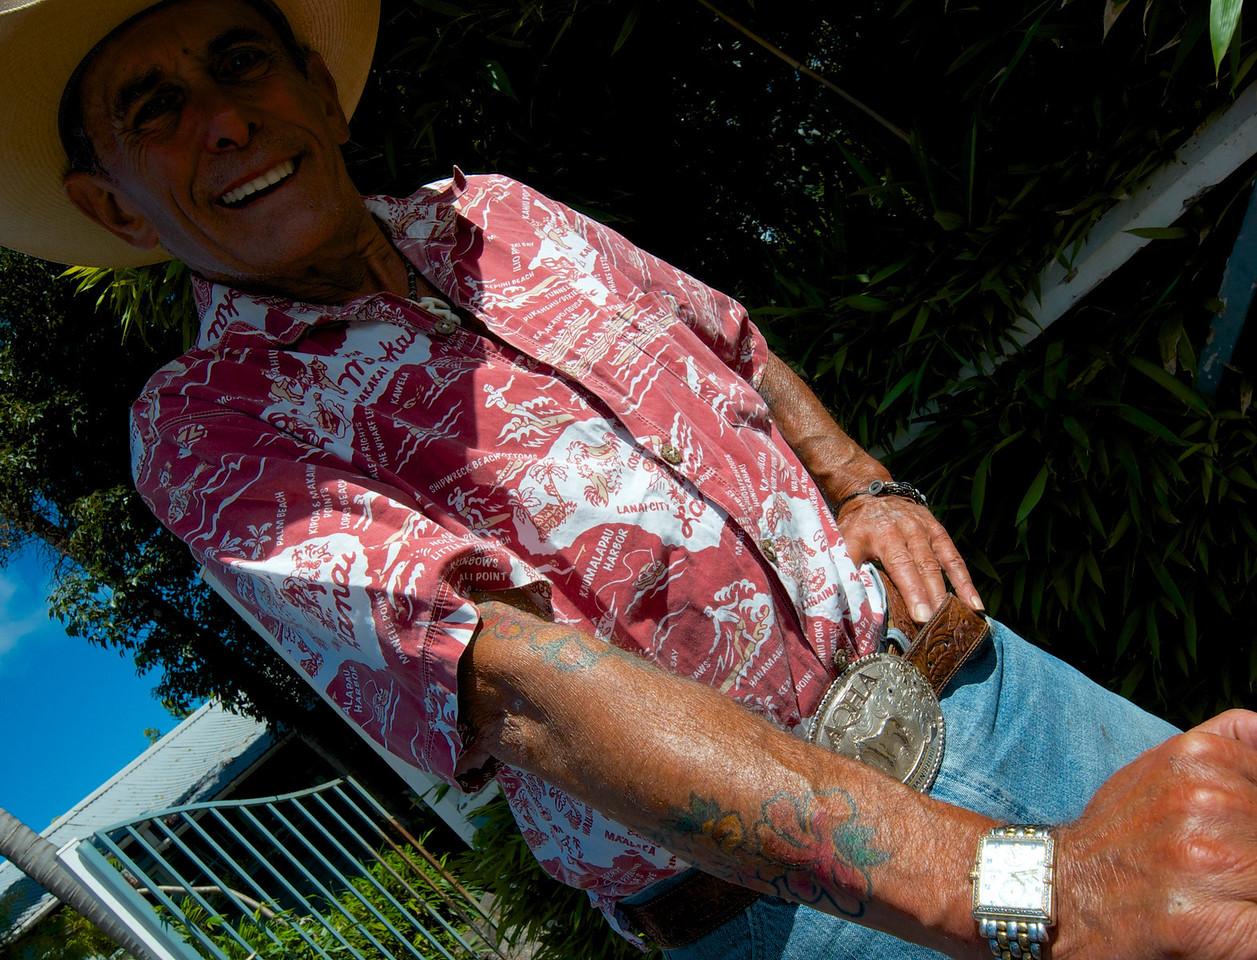 Huey! Makawao Cowboy Mascot/Greeter. Opened Kaanapali Beach Hotel in 1969 when he was young. Character, fun to talk to.....